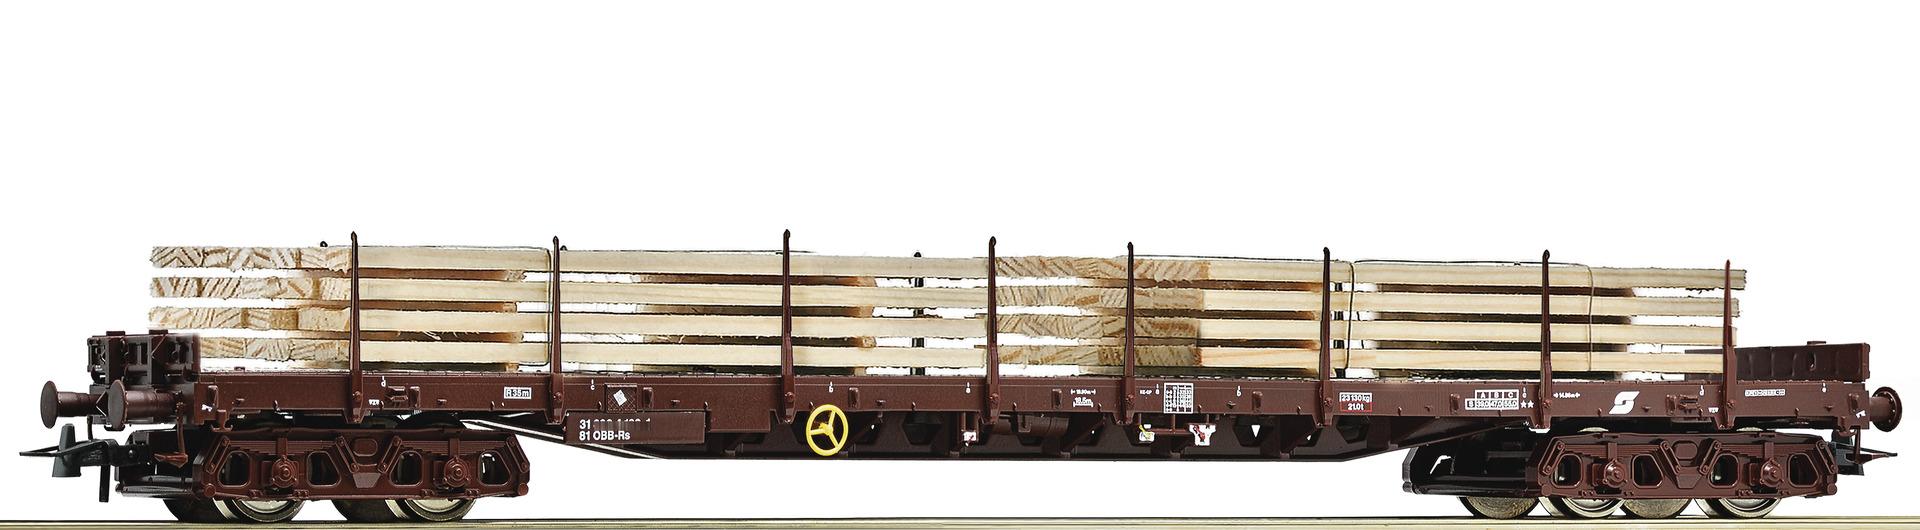 Roco76772 OBB flat car with wood load